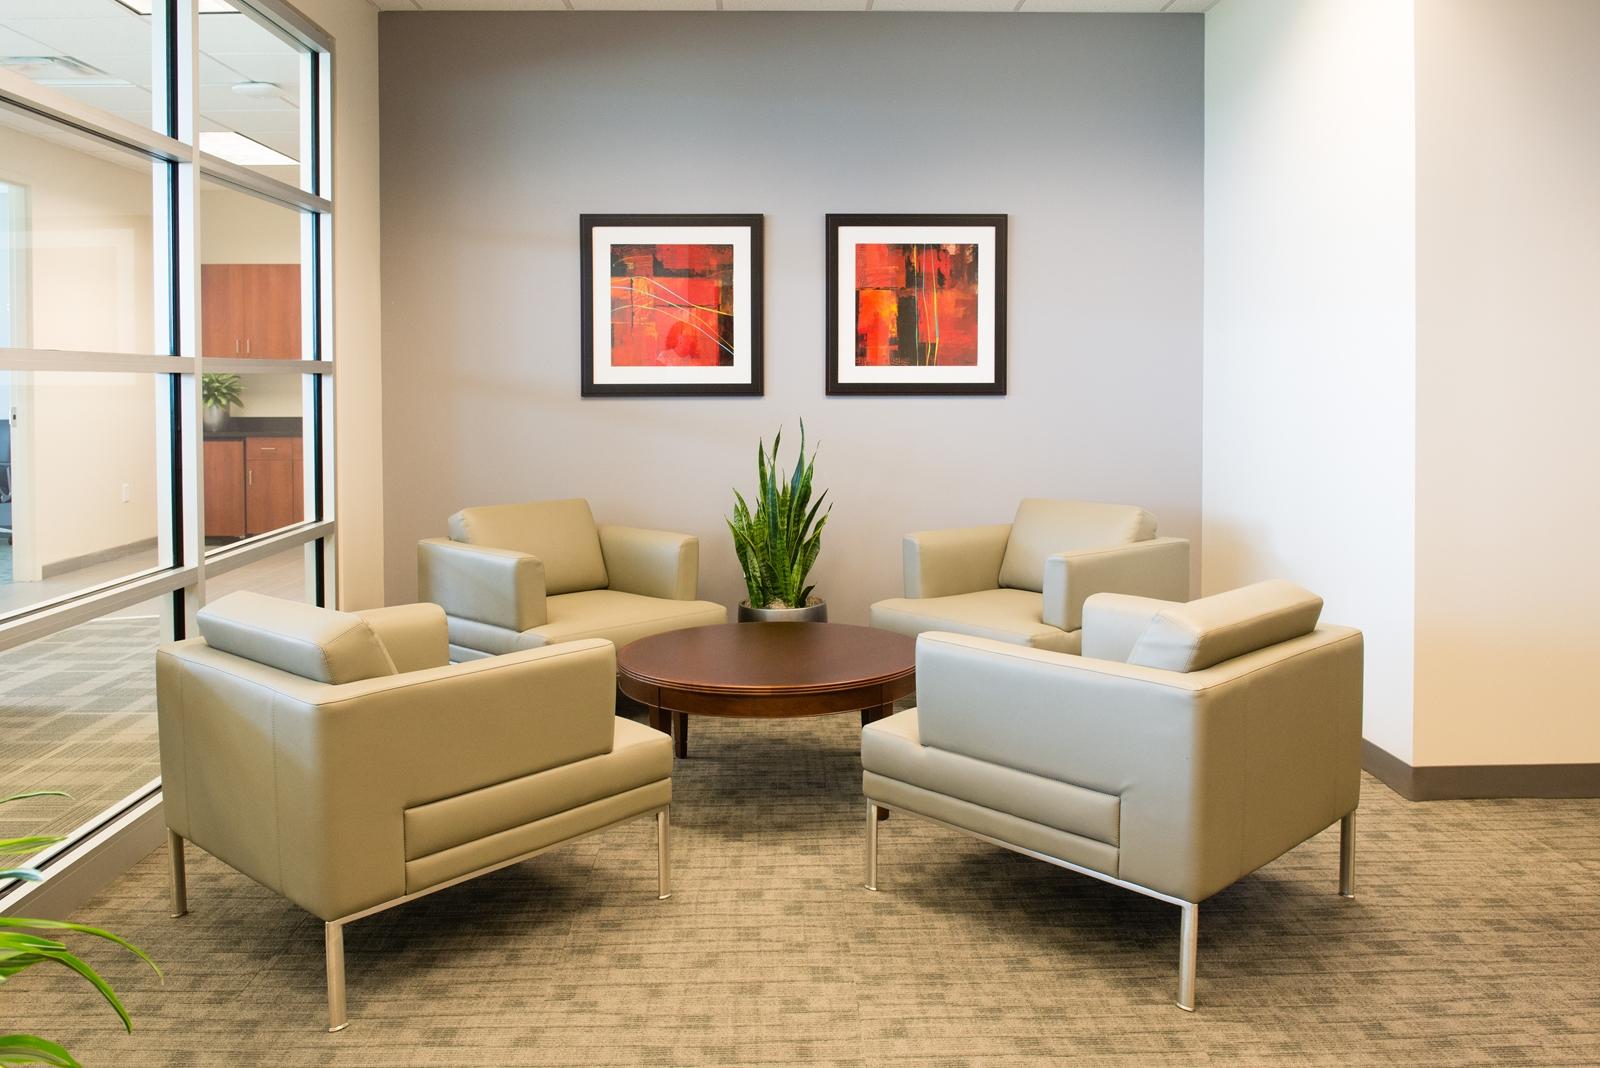 Interiors-044.jpg